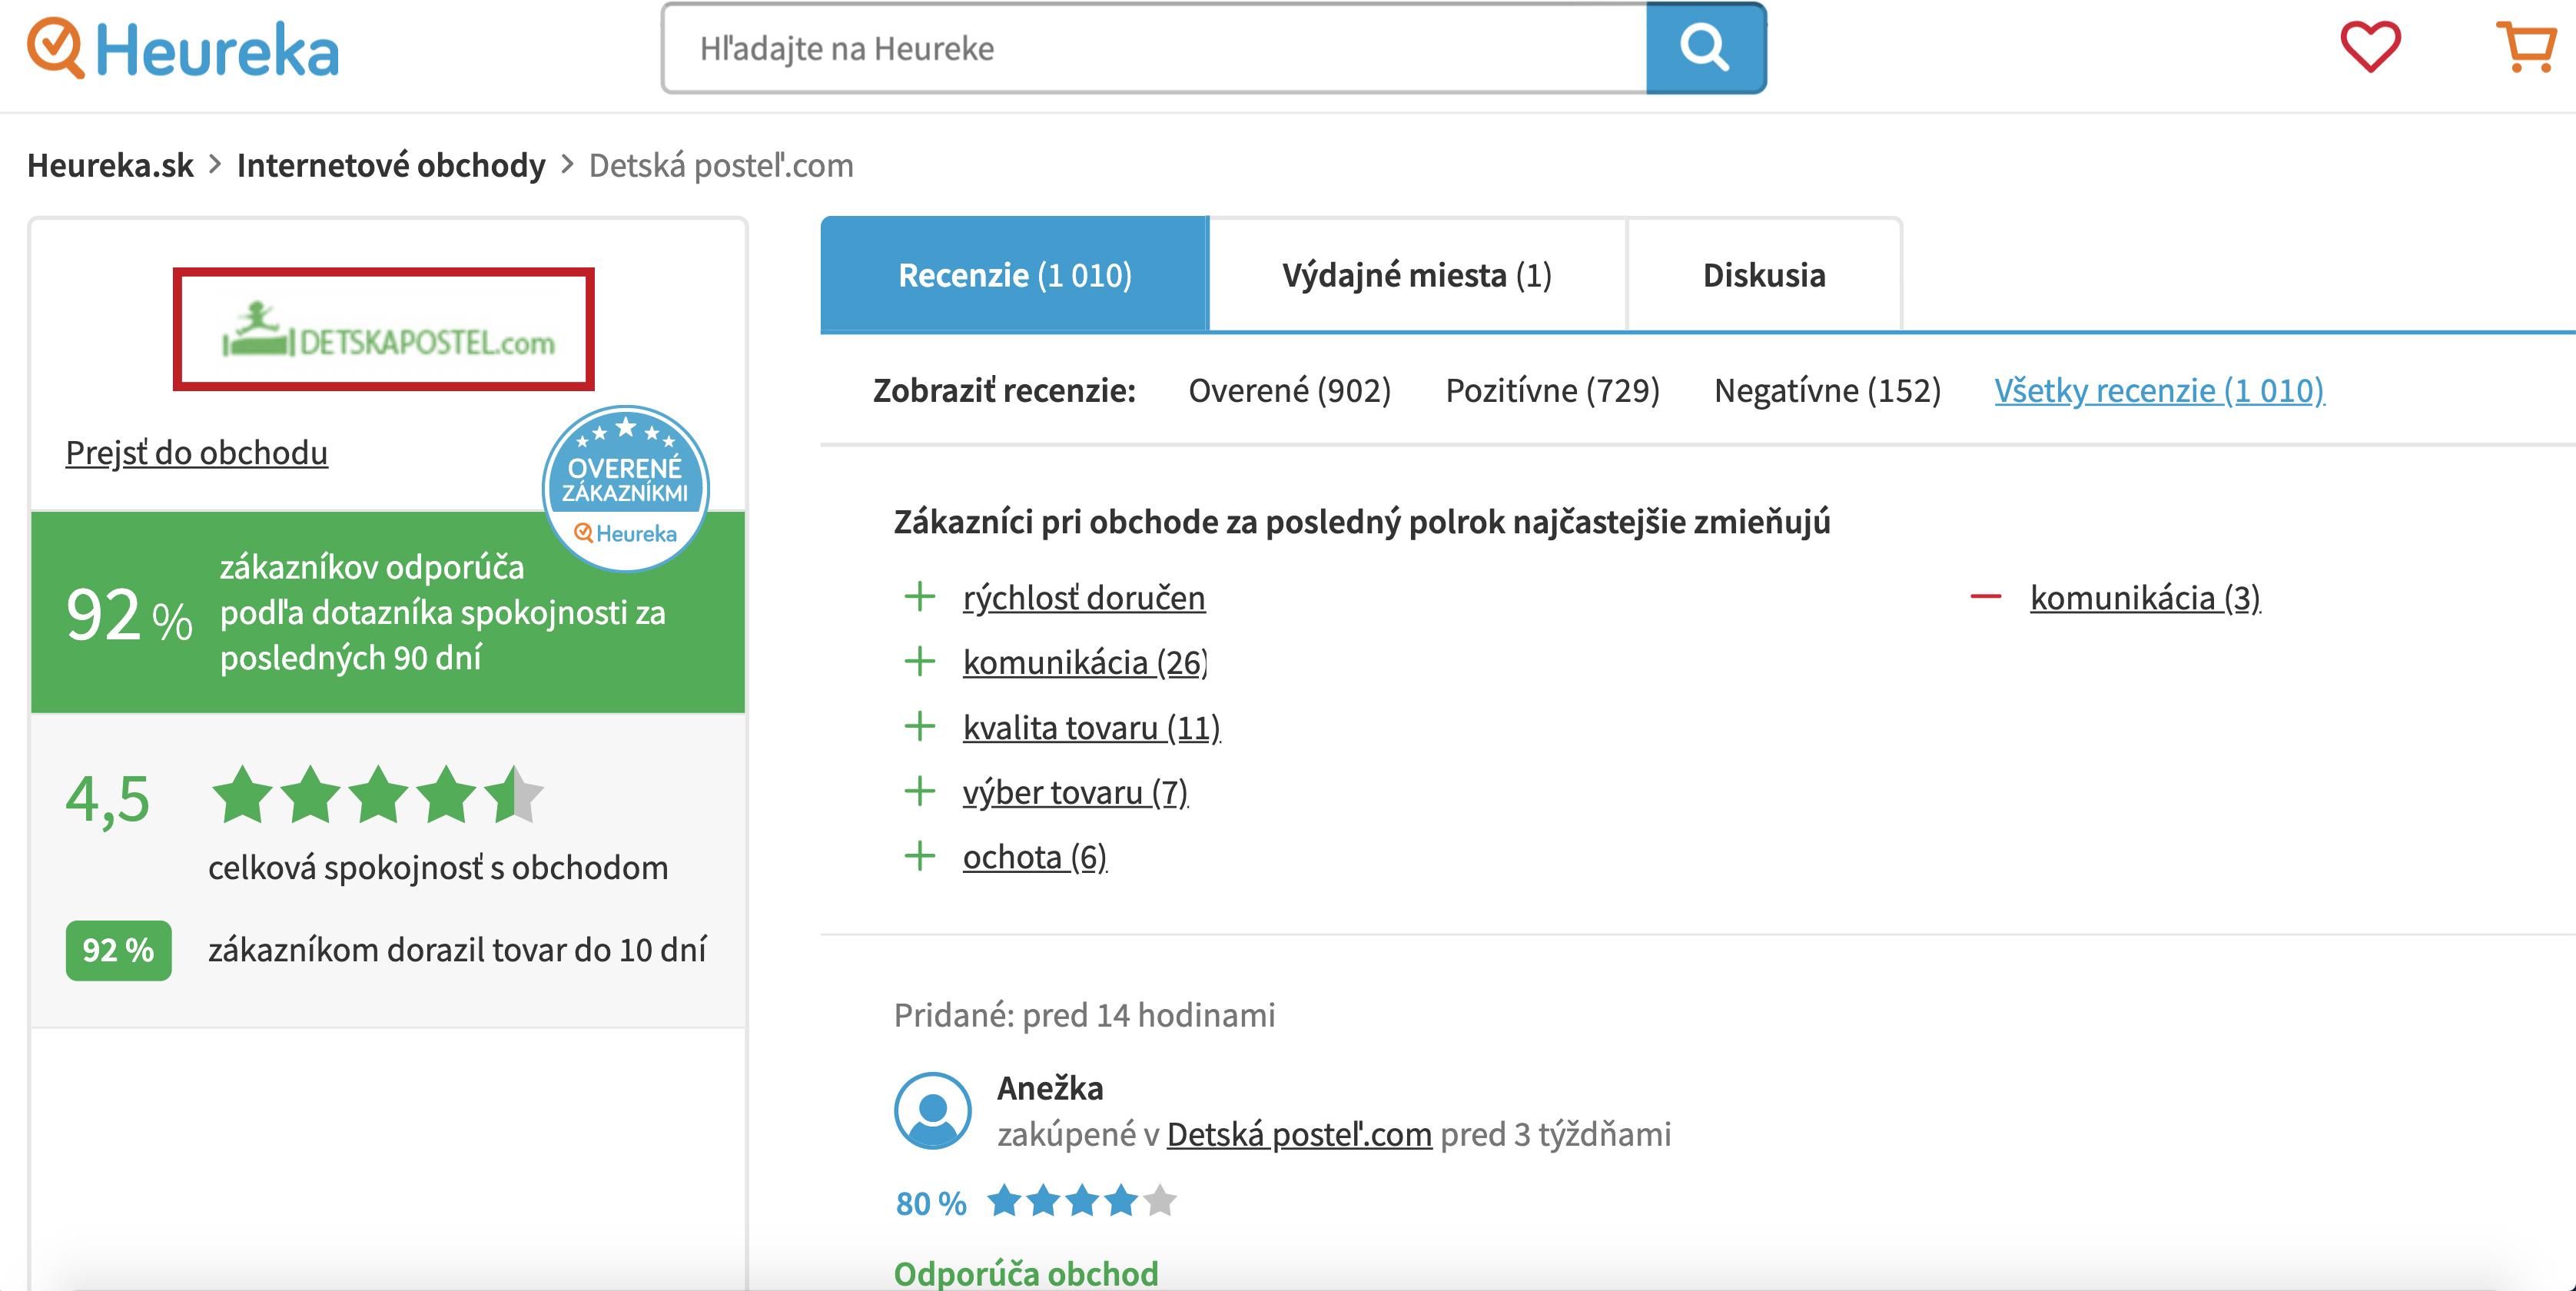 recenzie Heureka detskapostel.com